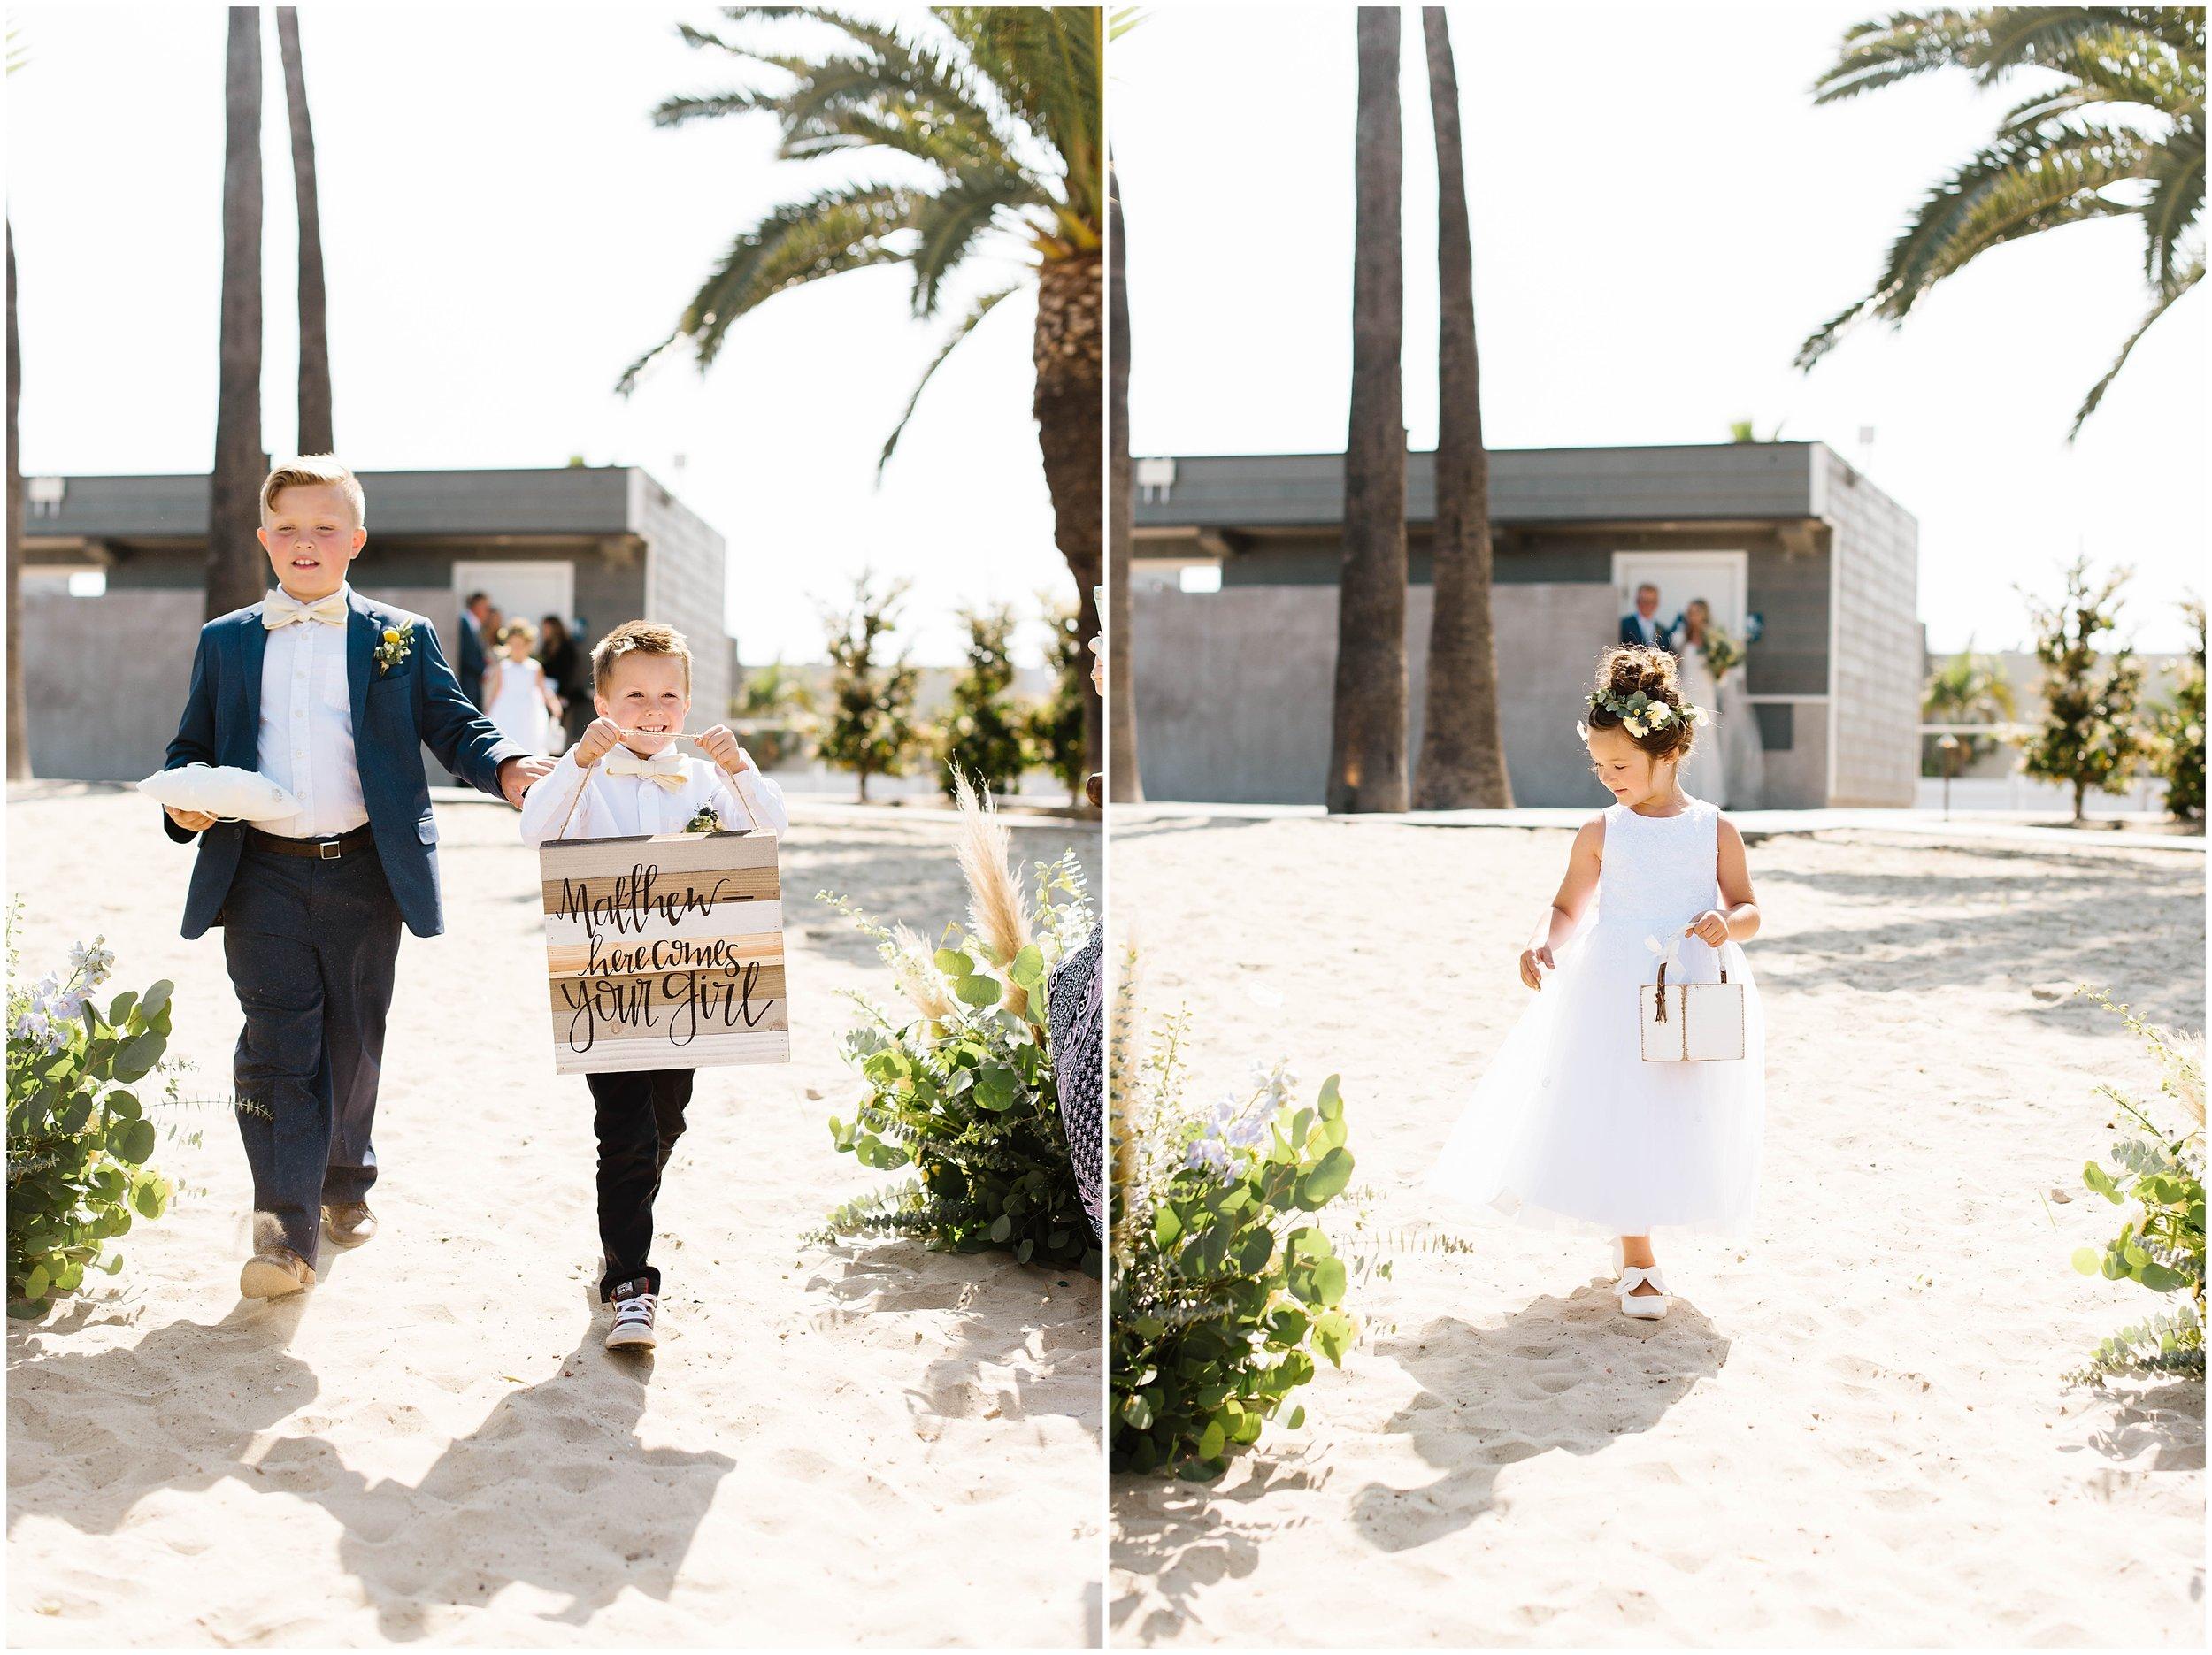 huntington-bay-club-wedding-amber-lynne-photography.jpg40.jpg